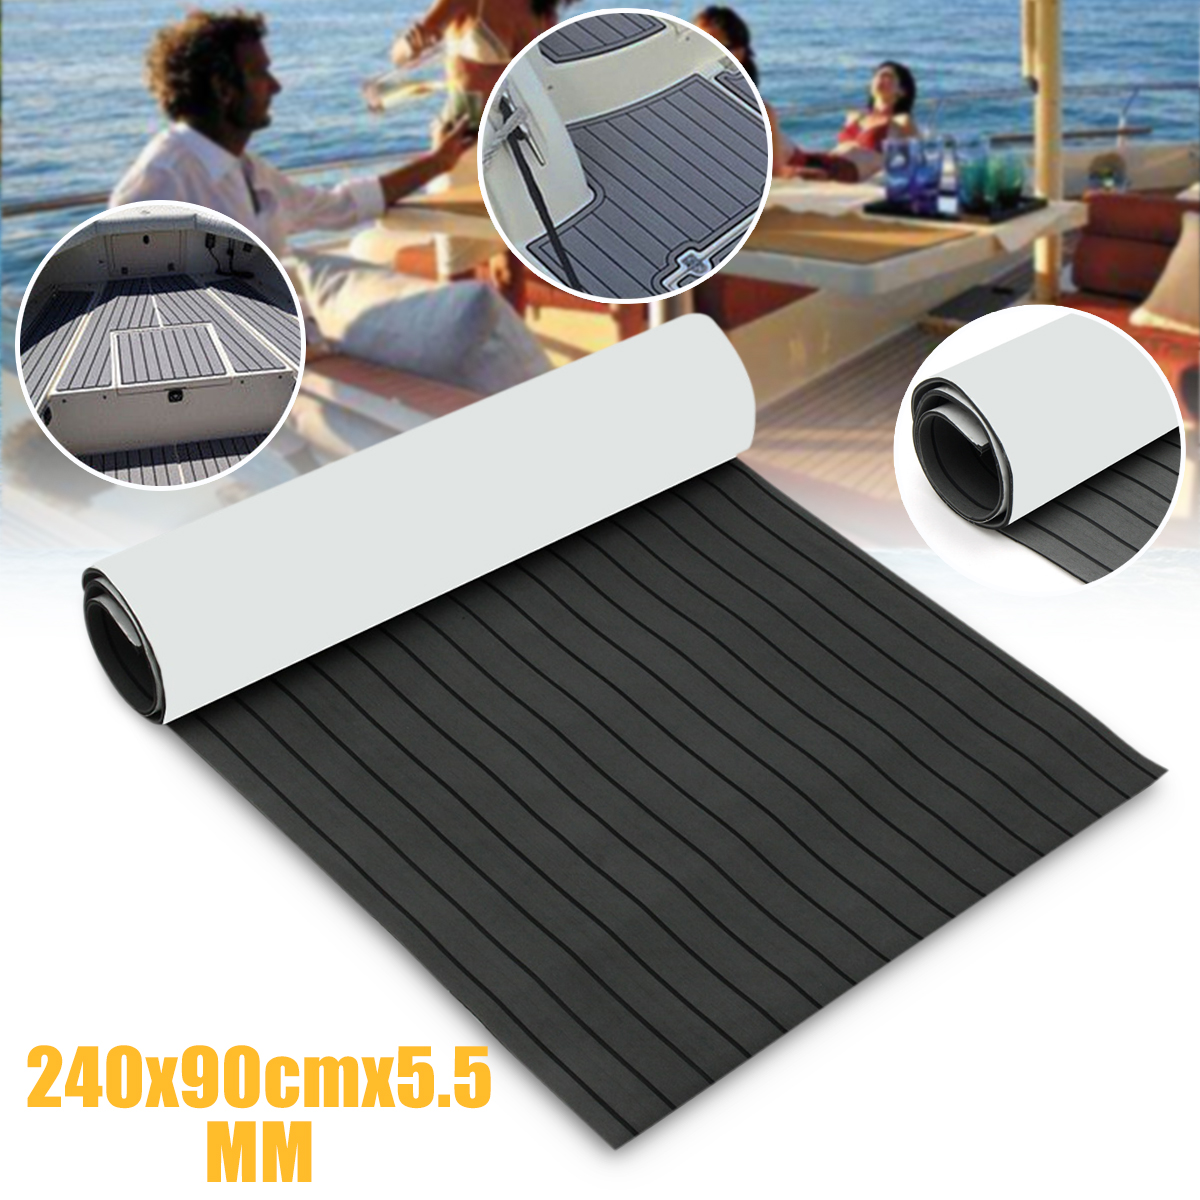 Self-Adhesive 90x240cm 5.5mm Dark Grey with Black EVA Foam Teak Boat Flooring Sheet Yacht Synthetic Teak Decking Pad teak house ваза ingrid